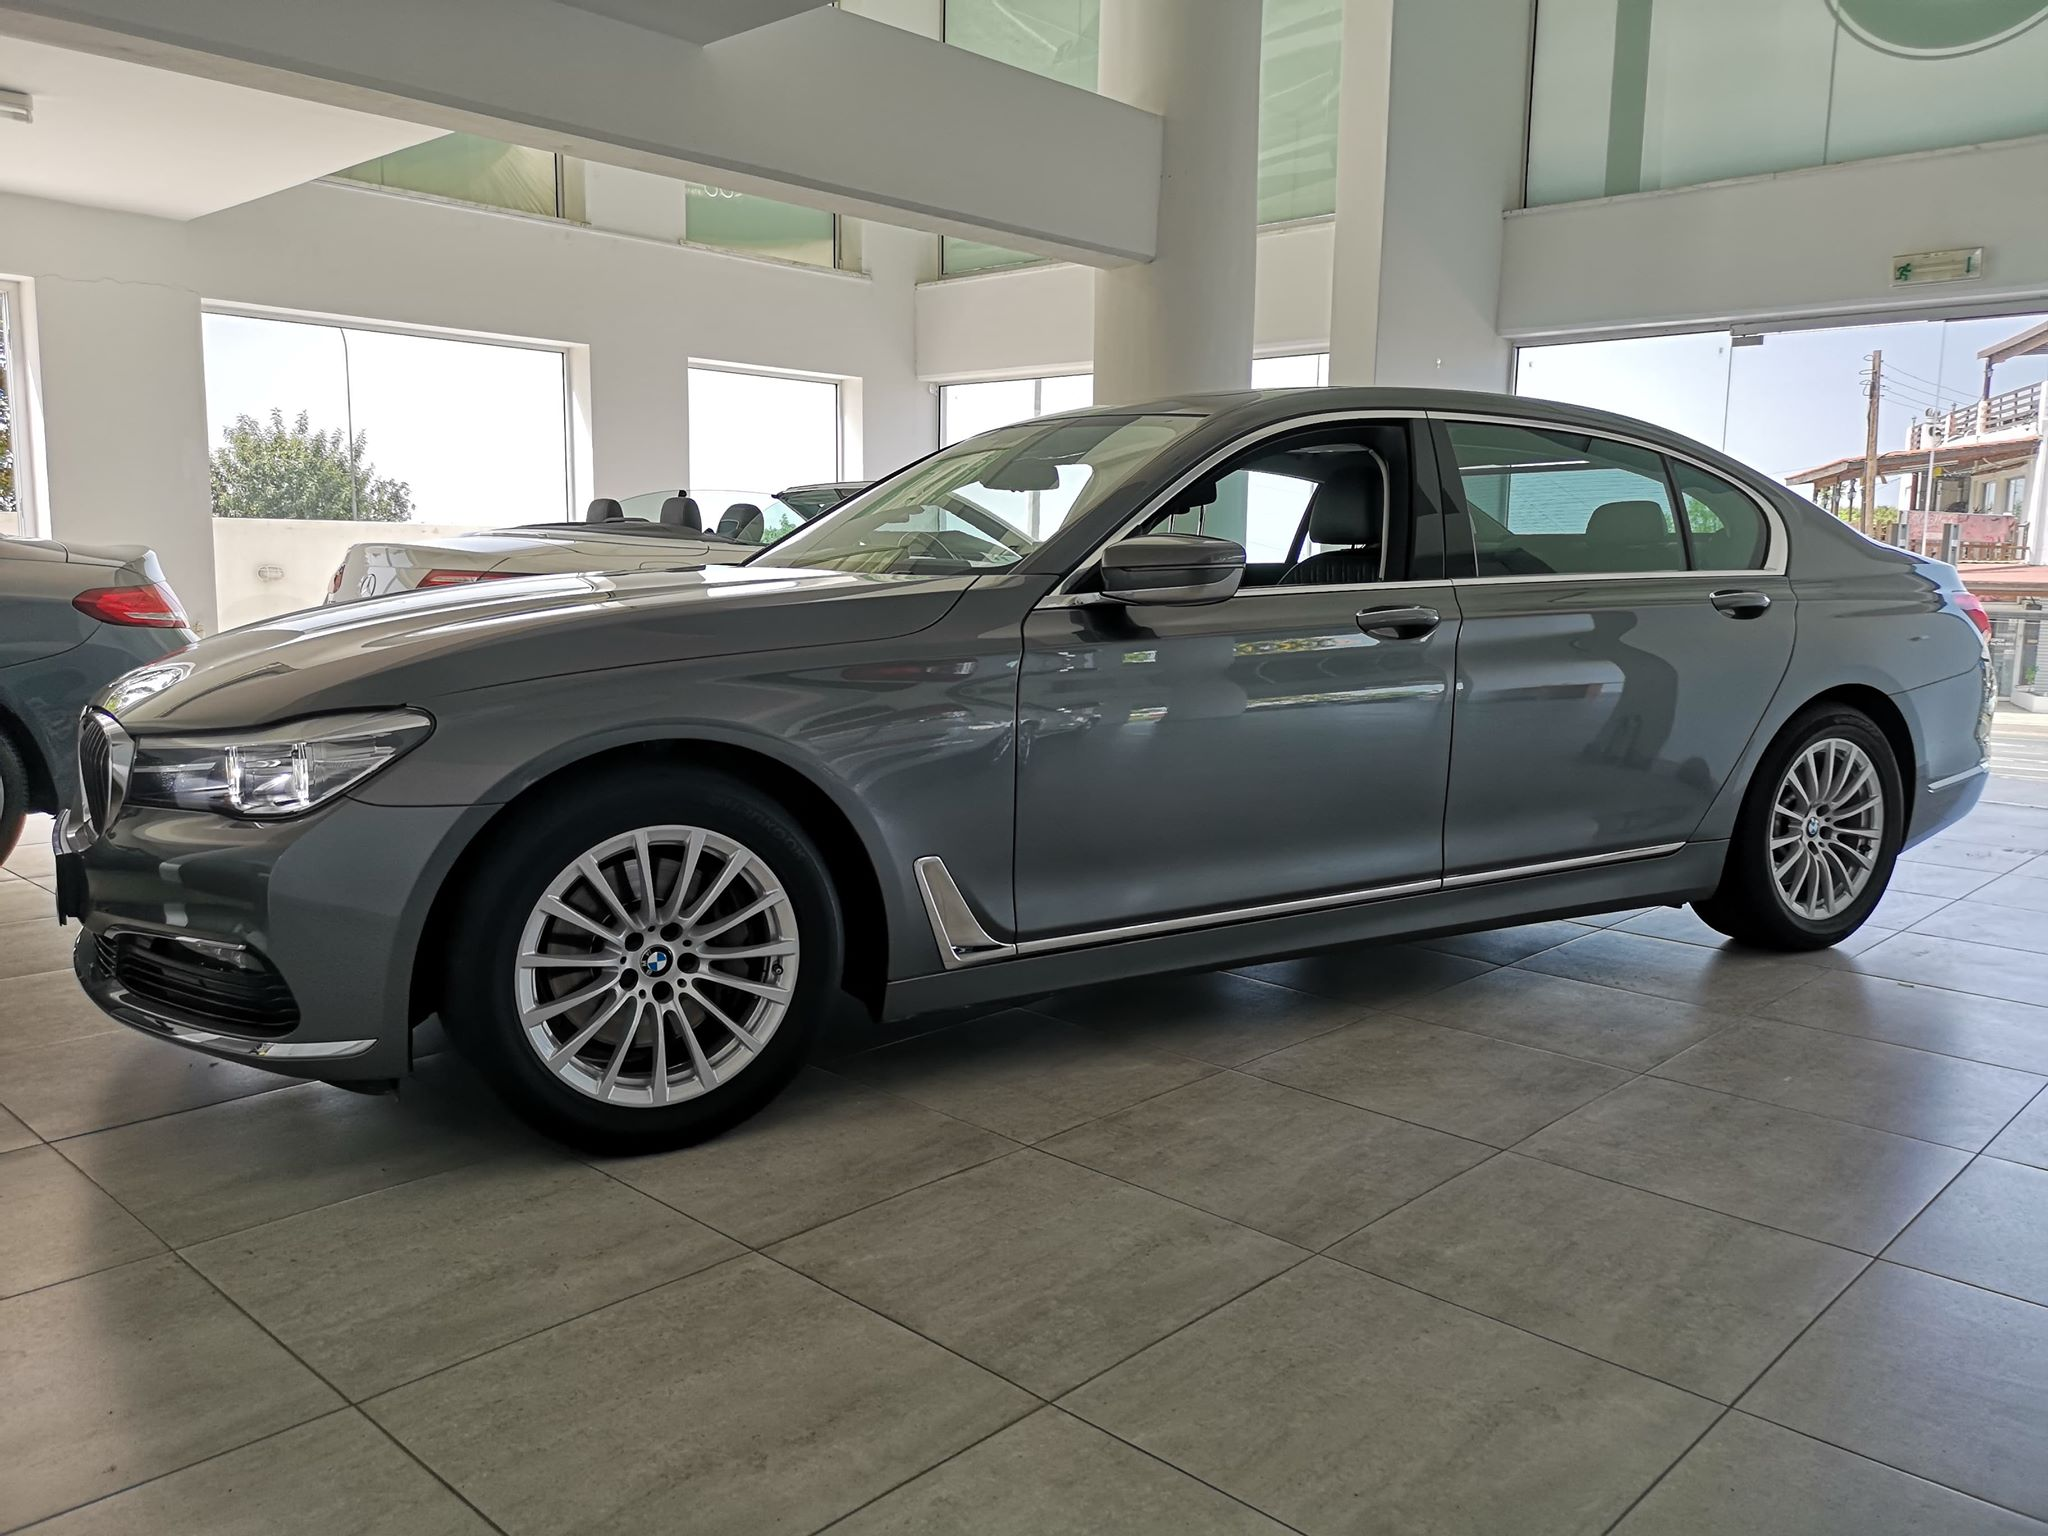 BMW 740 LONG HYBRID ELECTRIC 3.0LTRS PETROL